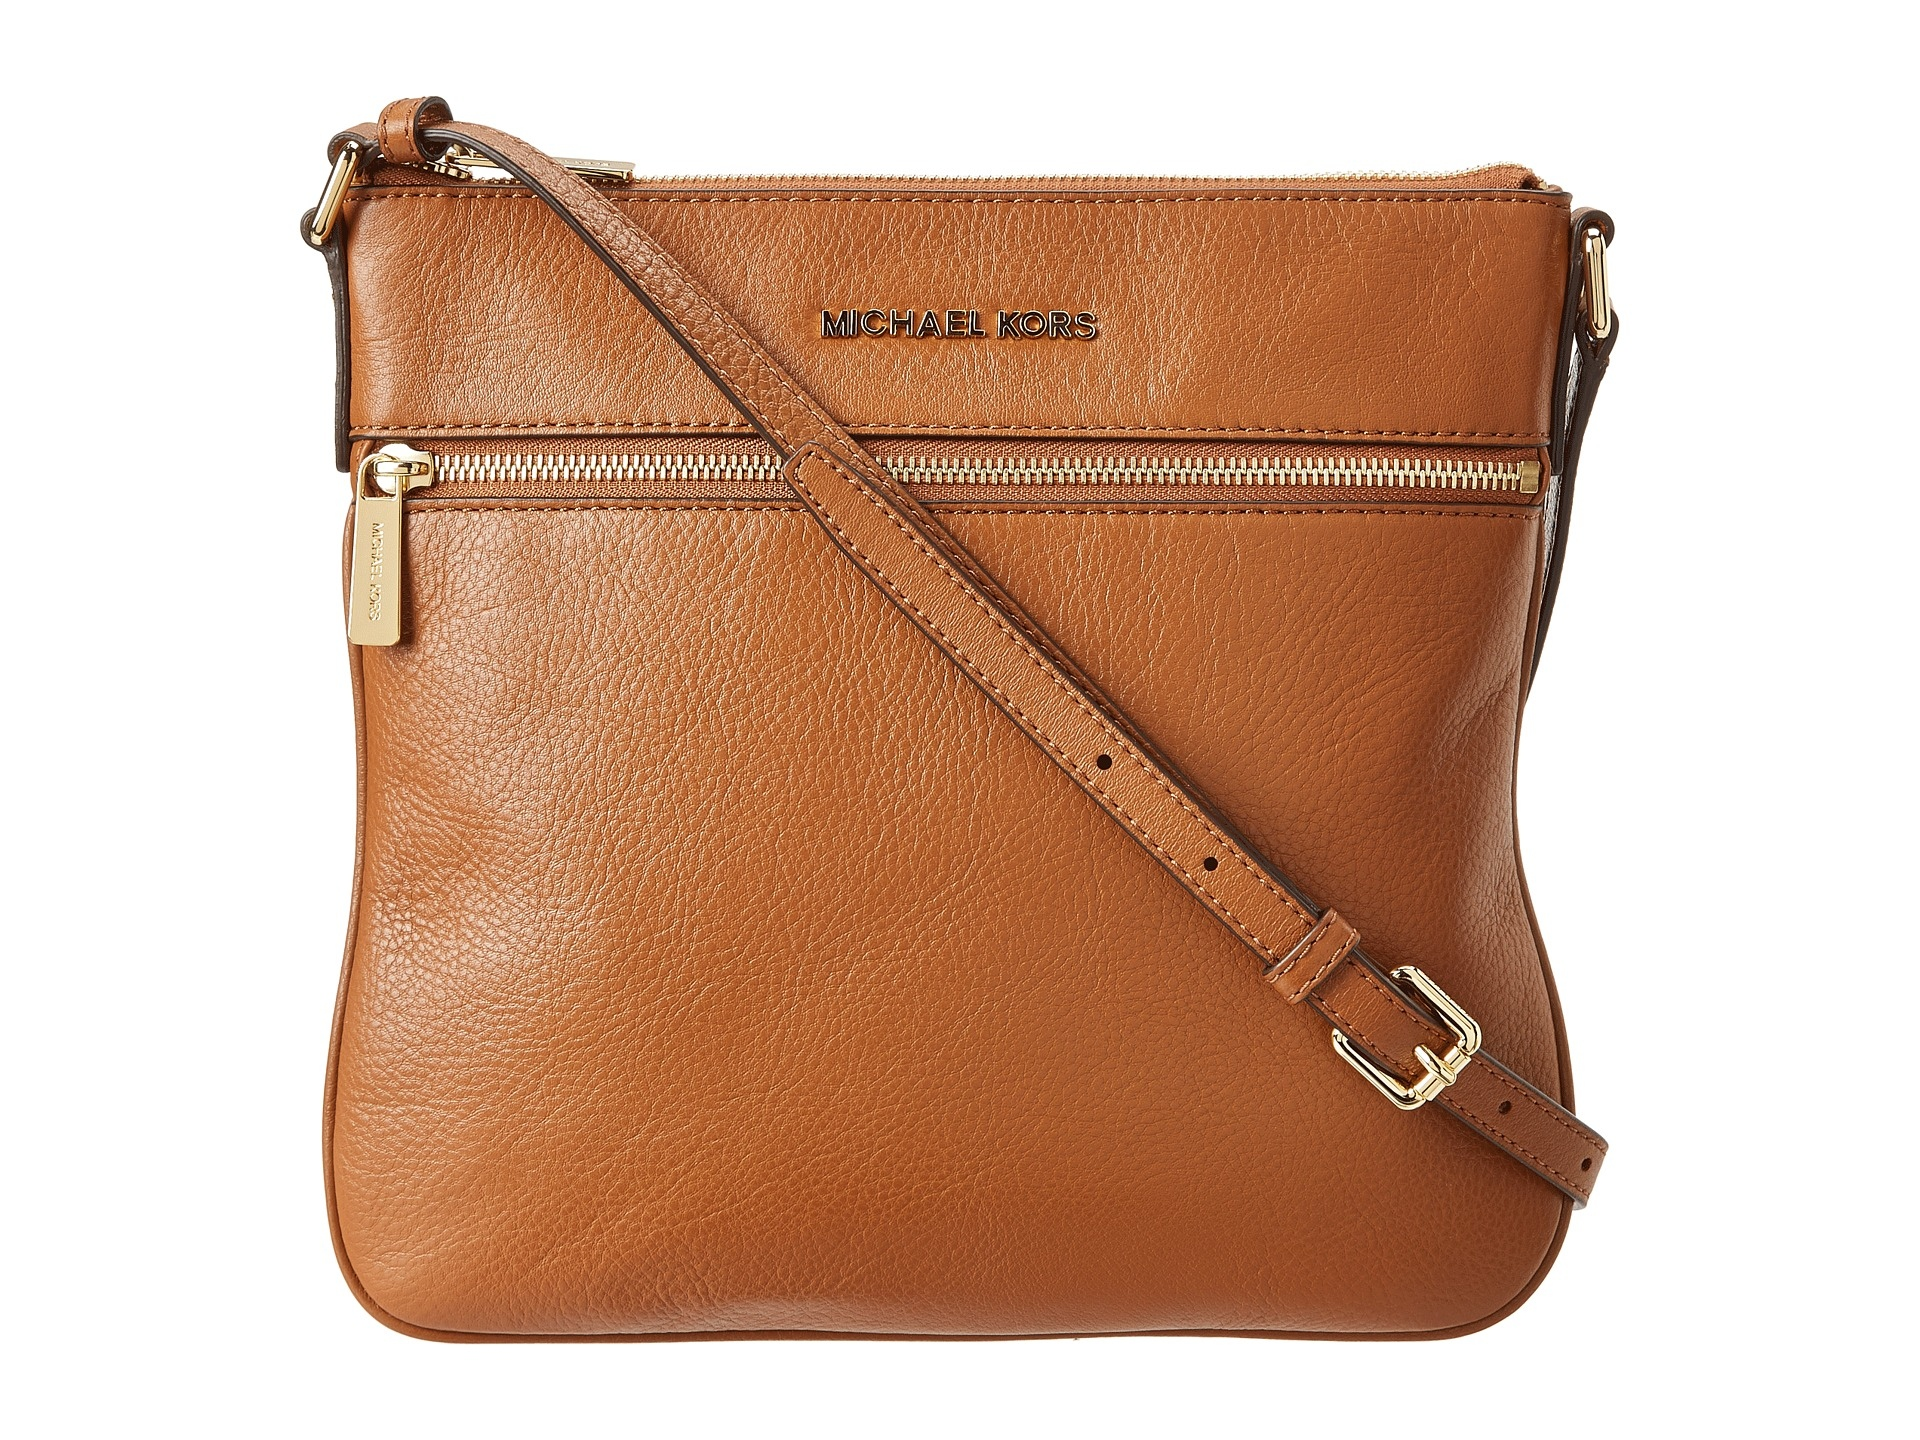 Nahka Käsilaukku : Michael kors k?silaukut laukku id